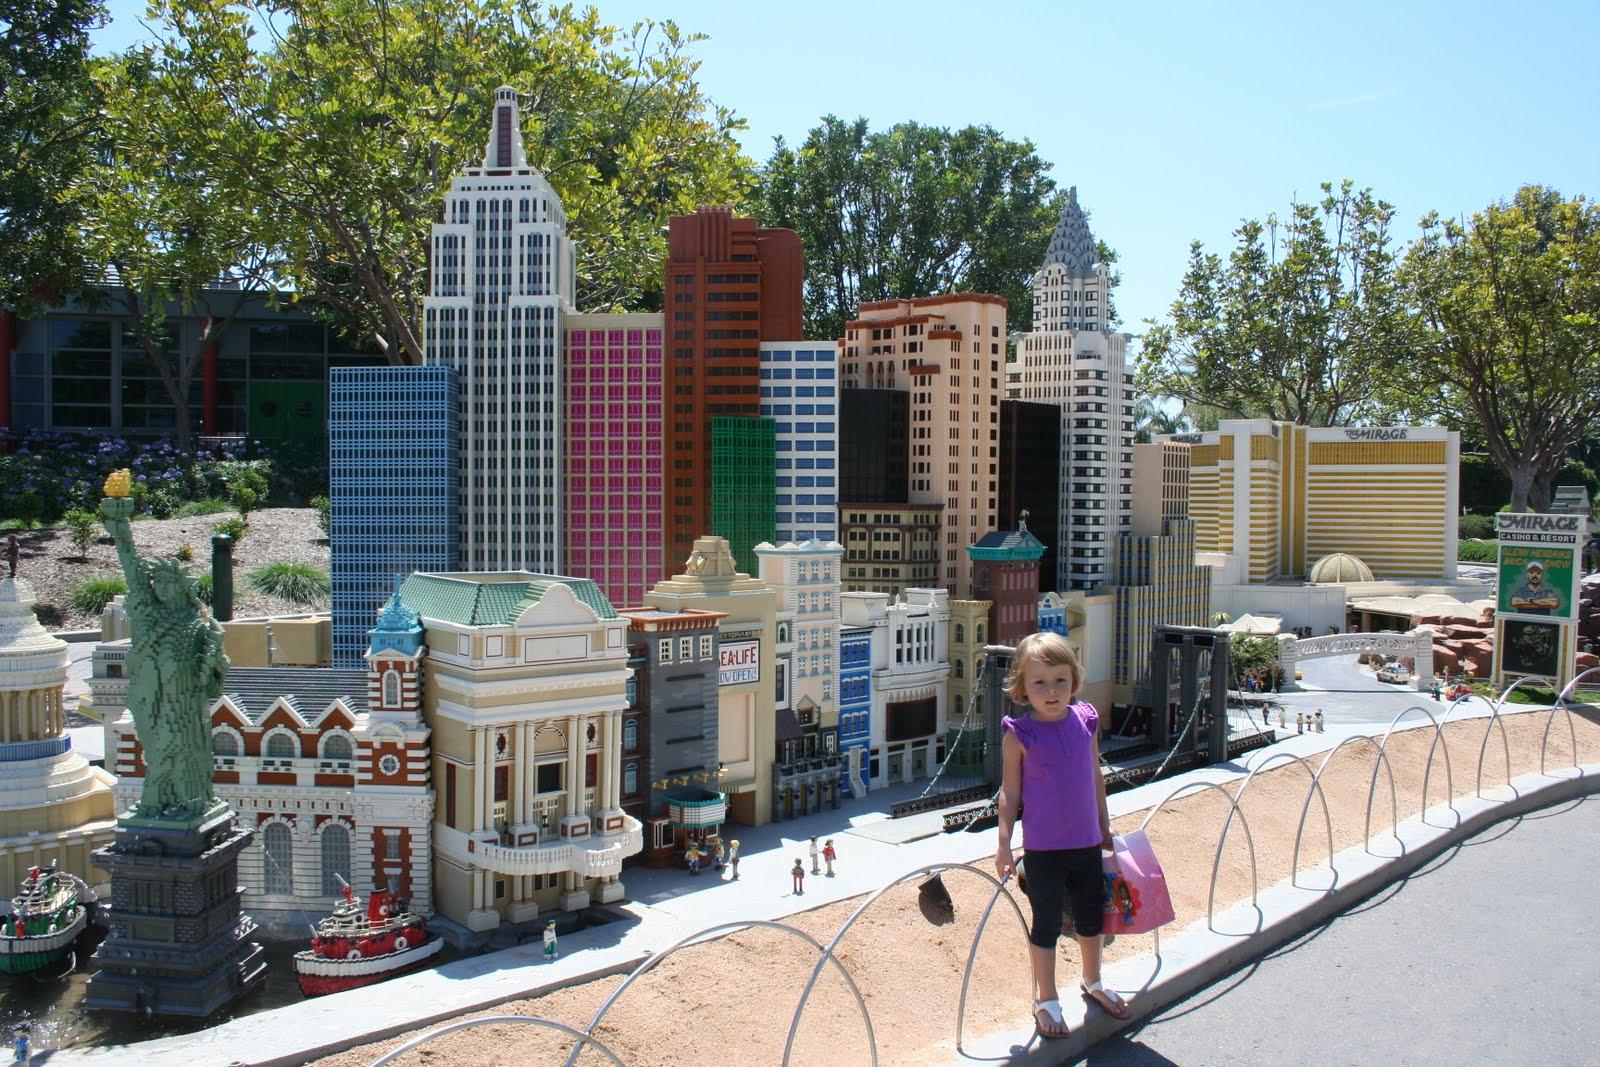 La Story August 2010 Kaos Pria T Shirt Short Sleeve Sy761 Legoland California Resort Rocks Blocks And Water Slides For Families